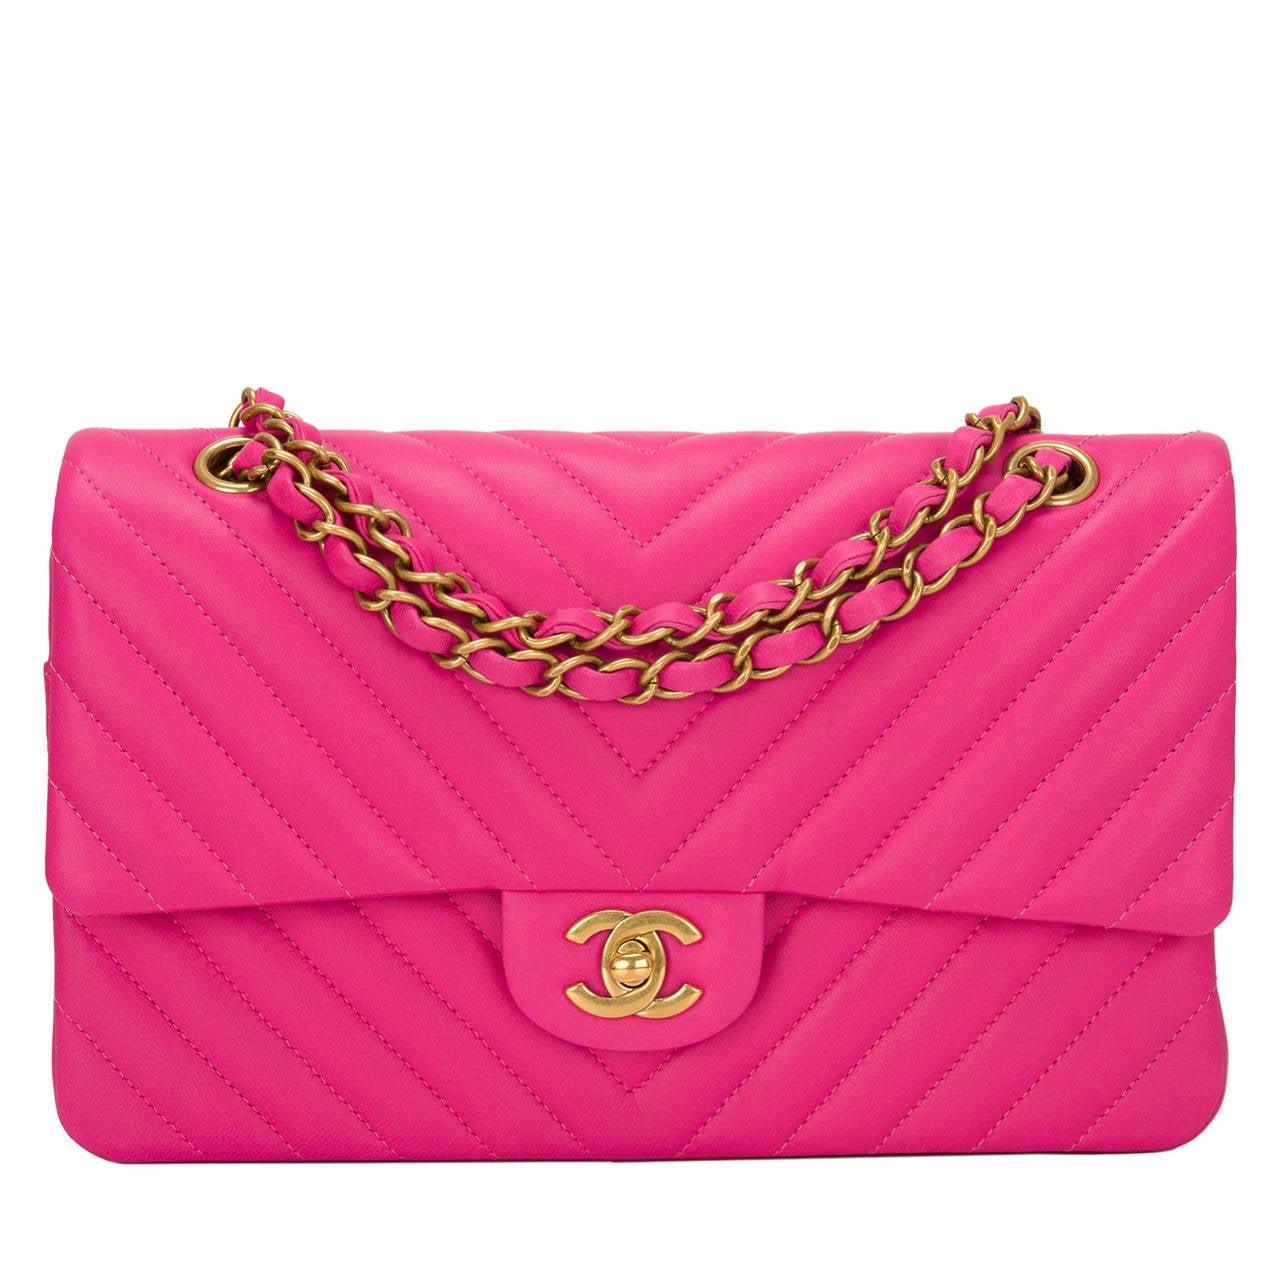 Chanel Fuchsia Chevron Medium Classic Double Flap Bag For Sale